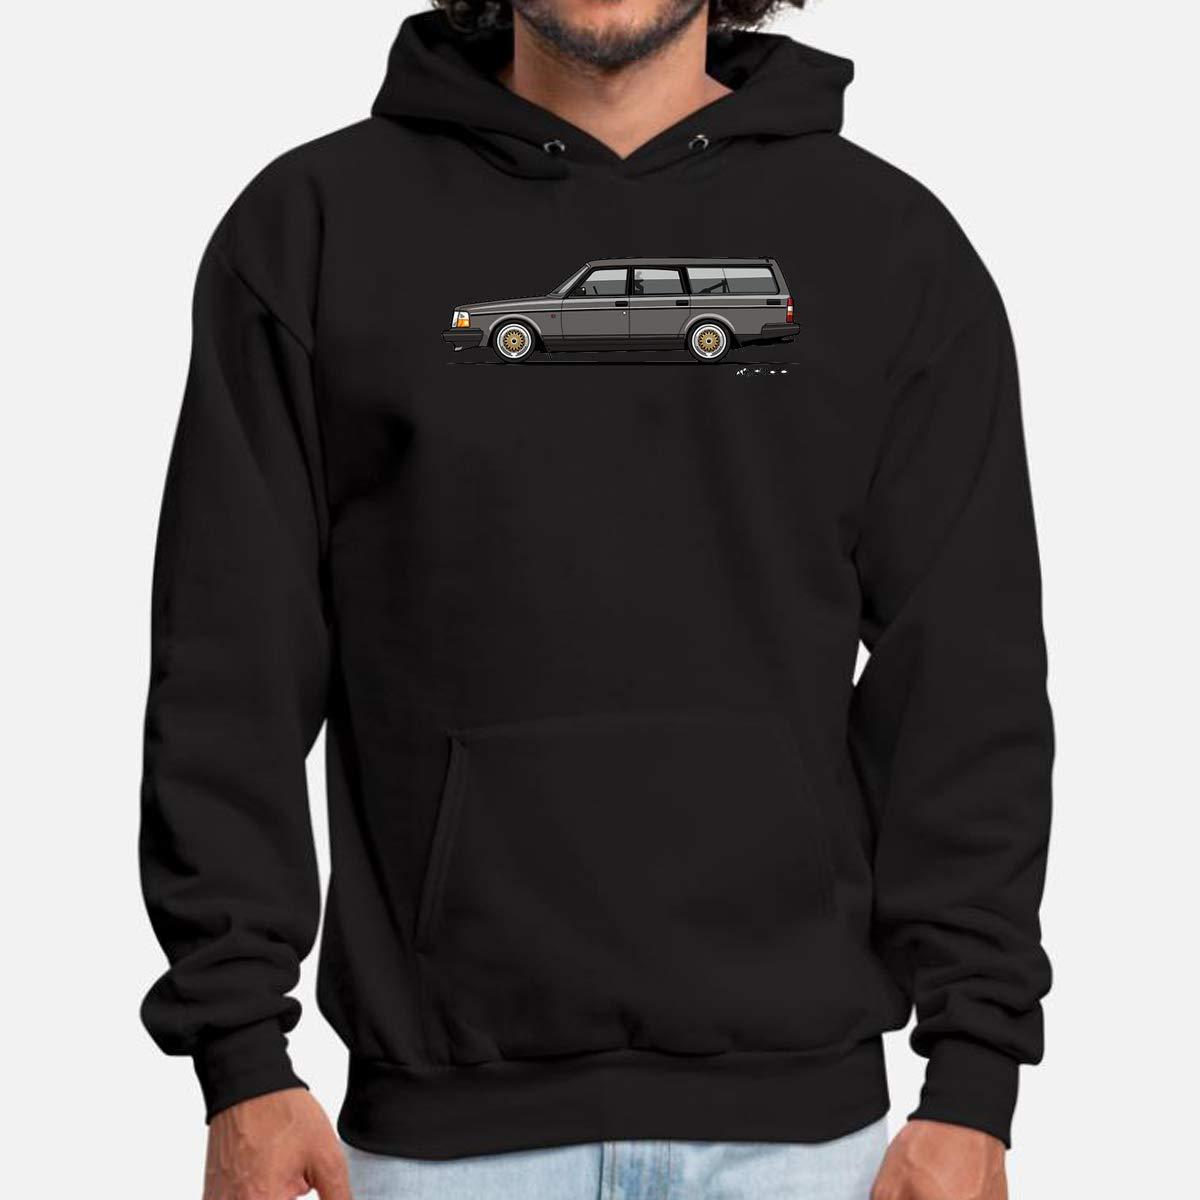 Men's Hooded Pullover Sweatshirt Funny Connorx27;s Volvo 240